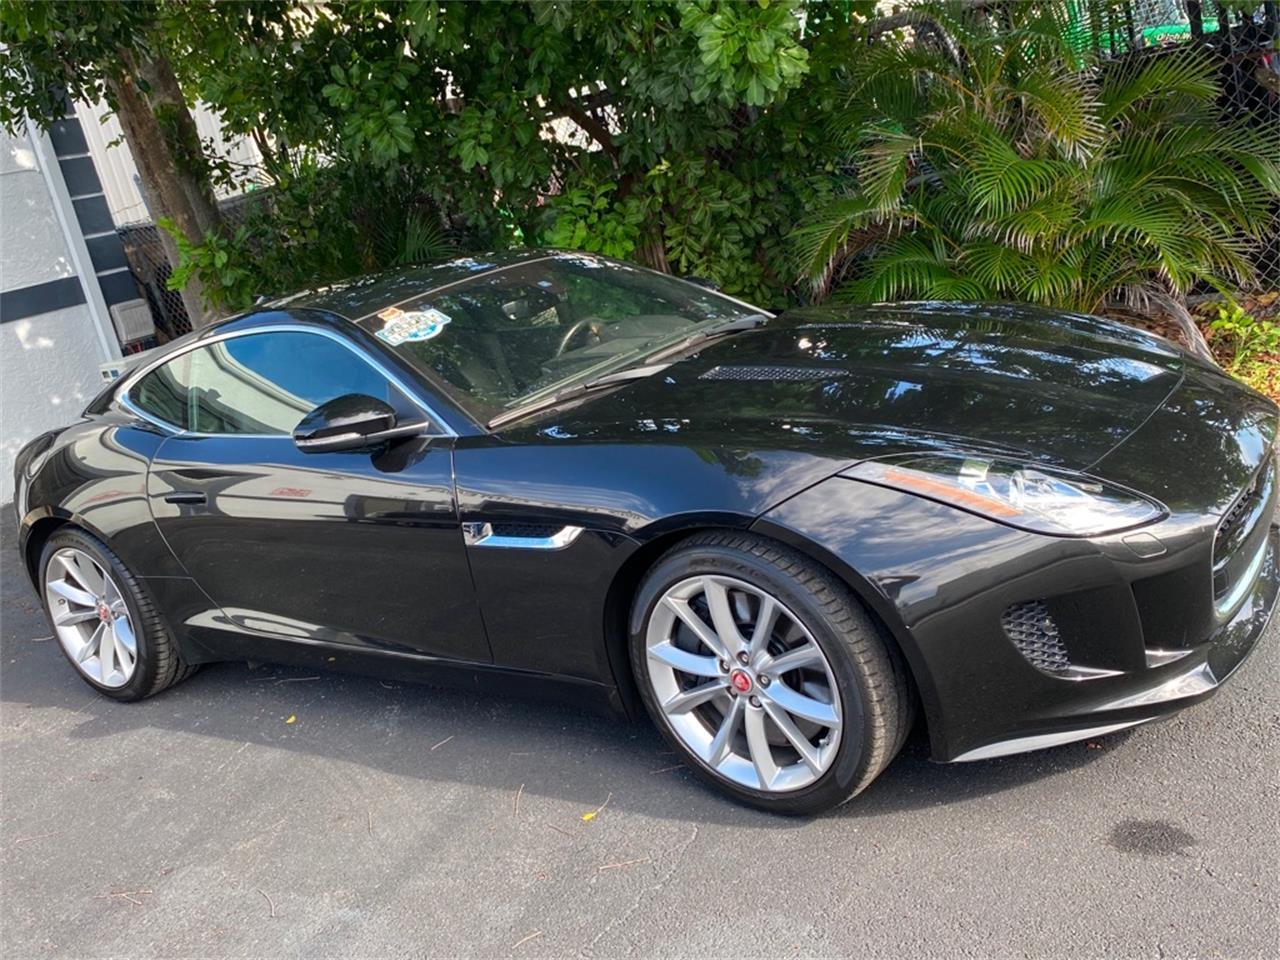 2017 Jaguar F-Type (CC-1368573) for sale in Boca Raton, Florida